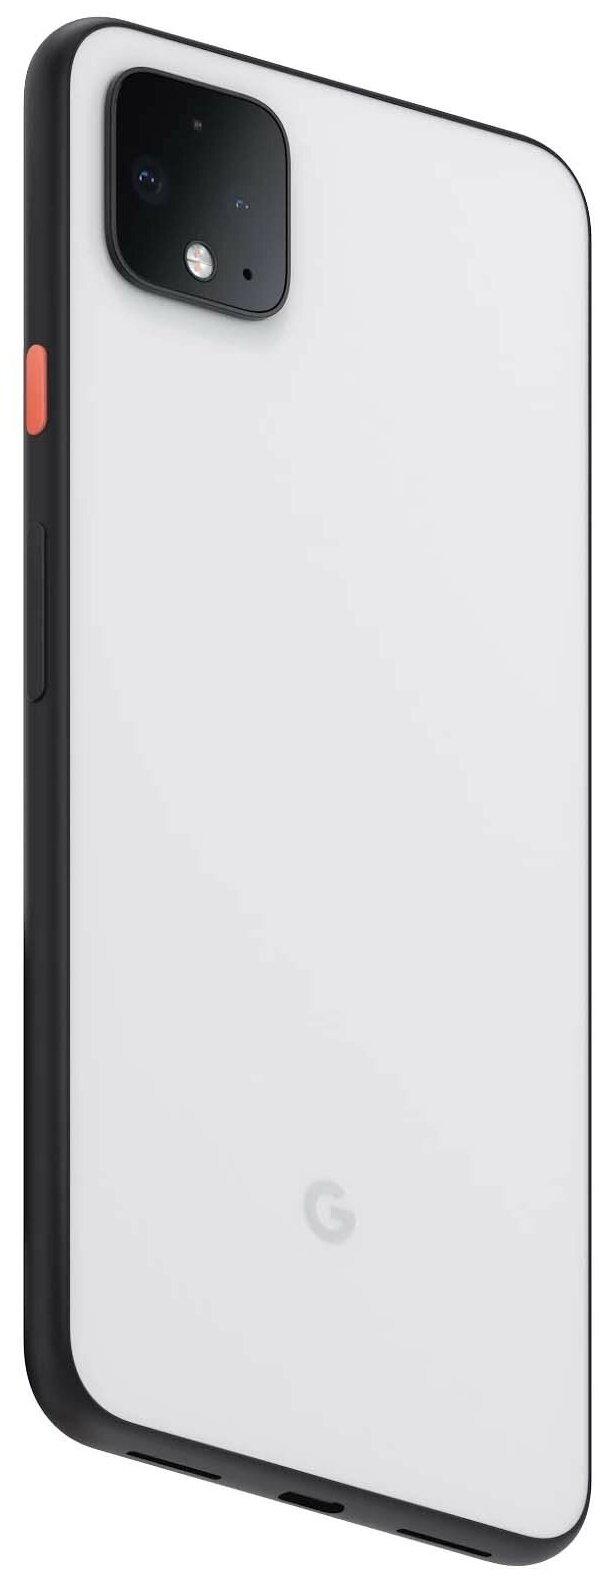 Google Pixel 4 6/64GB - операционная система: Android 10